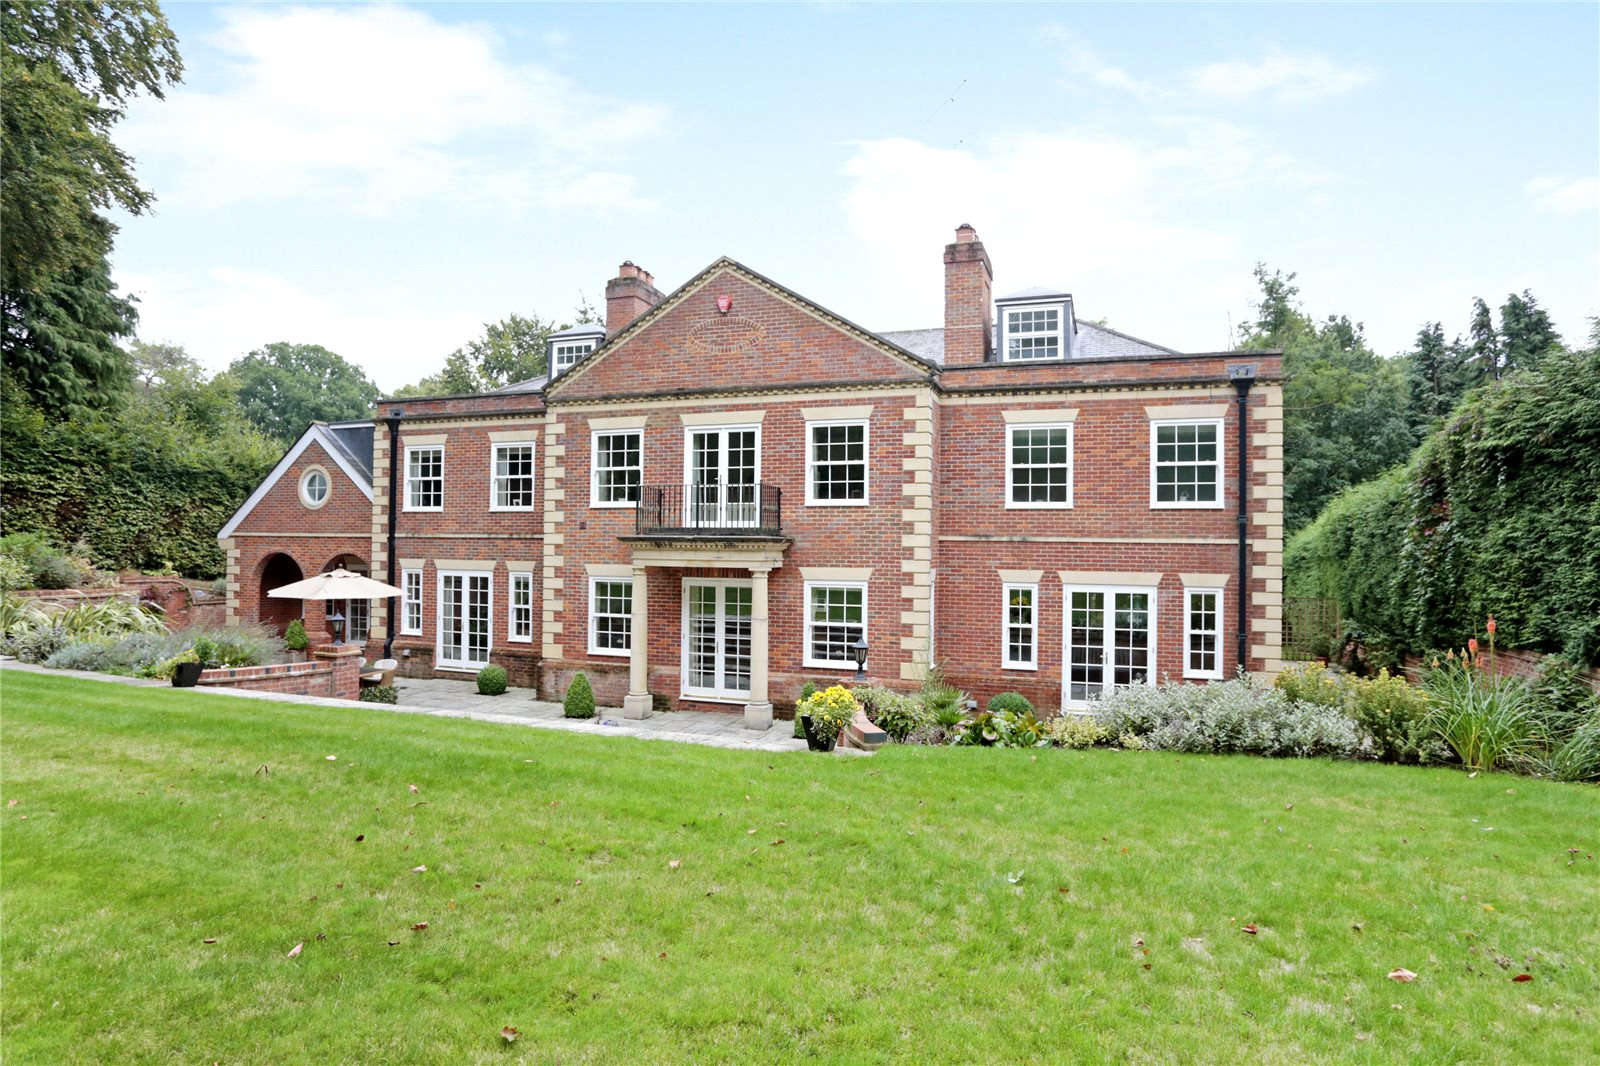 Villa per Vendita alle ore Top Park, Gerrards Cross, Buckinghamshire, SL9 Gerrards Cross, Inghilterra